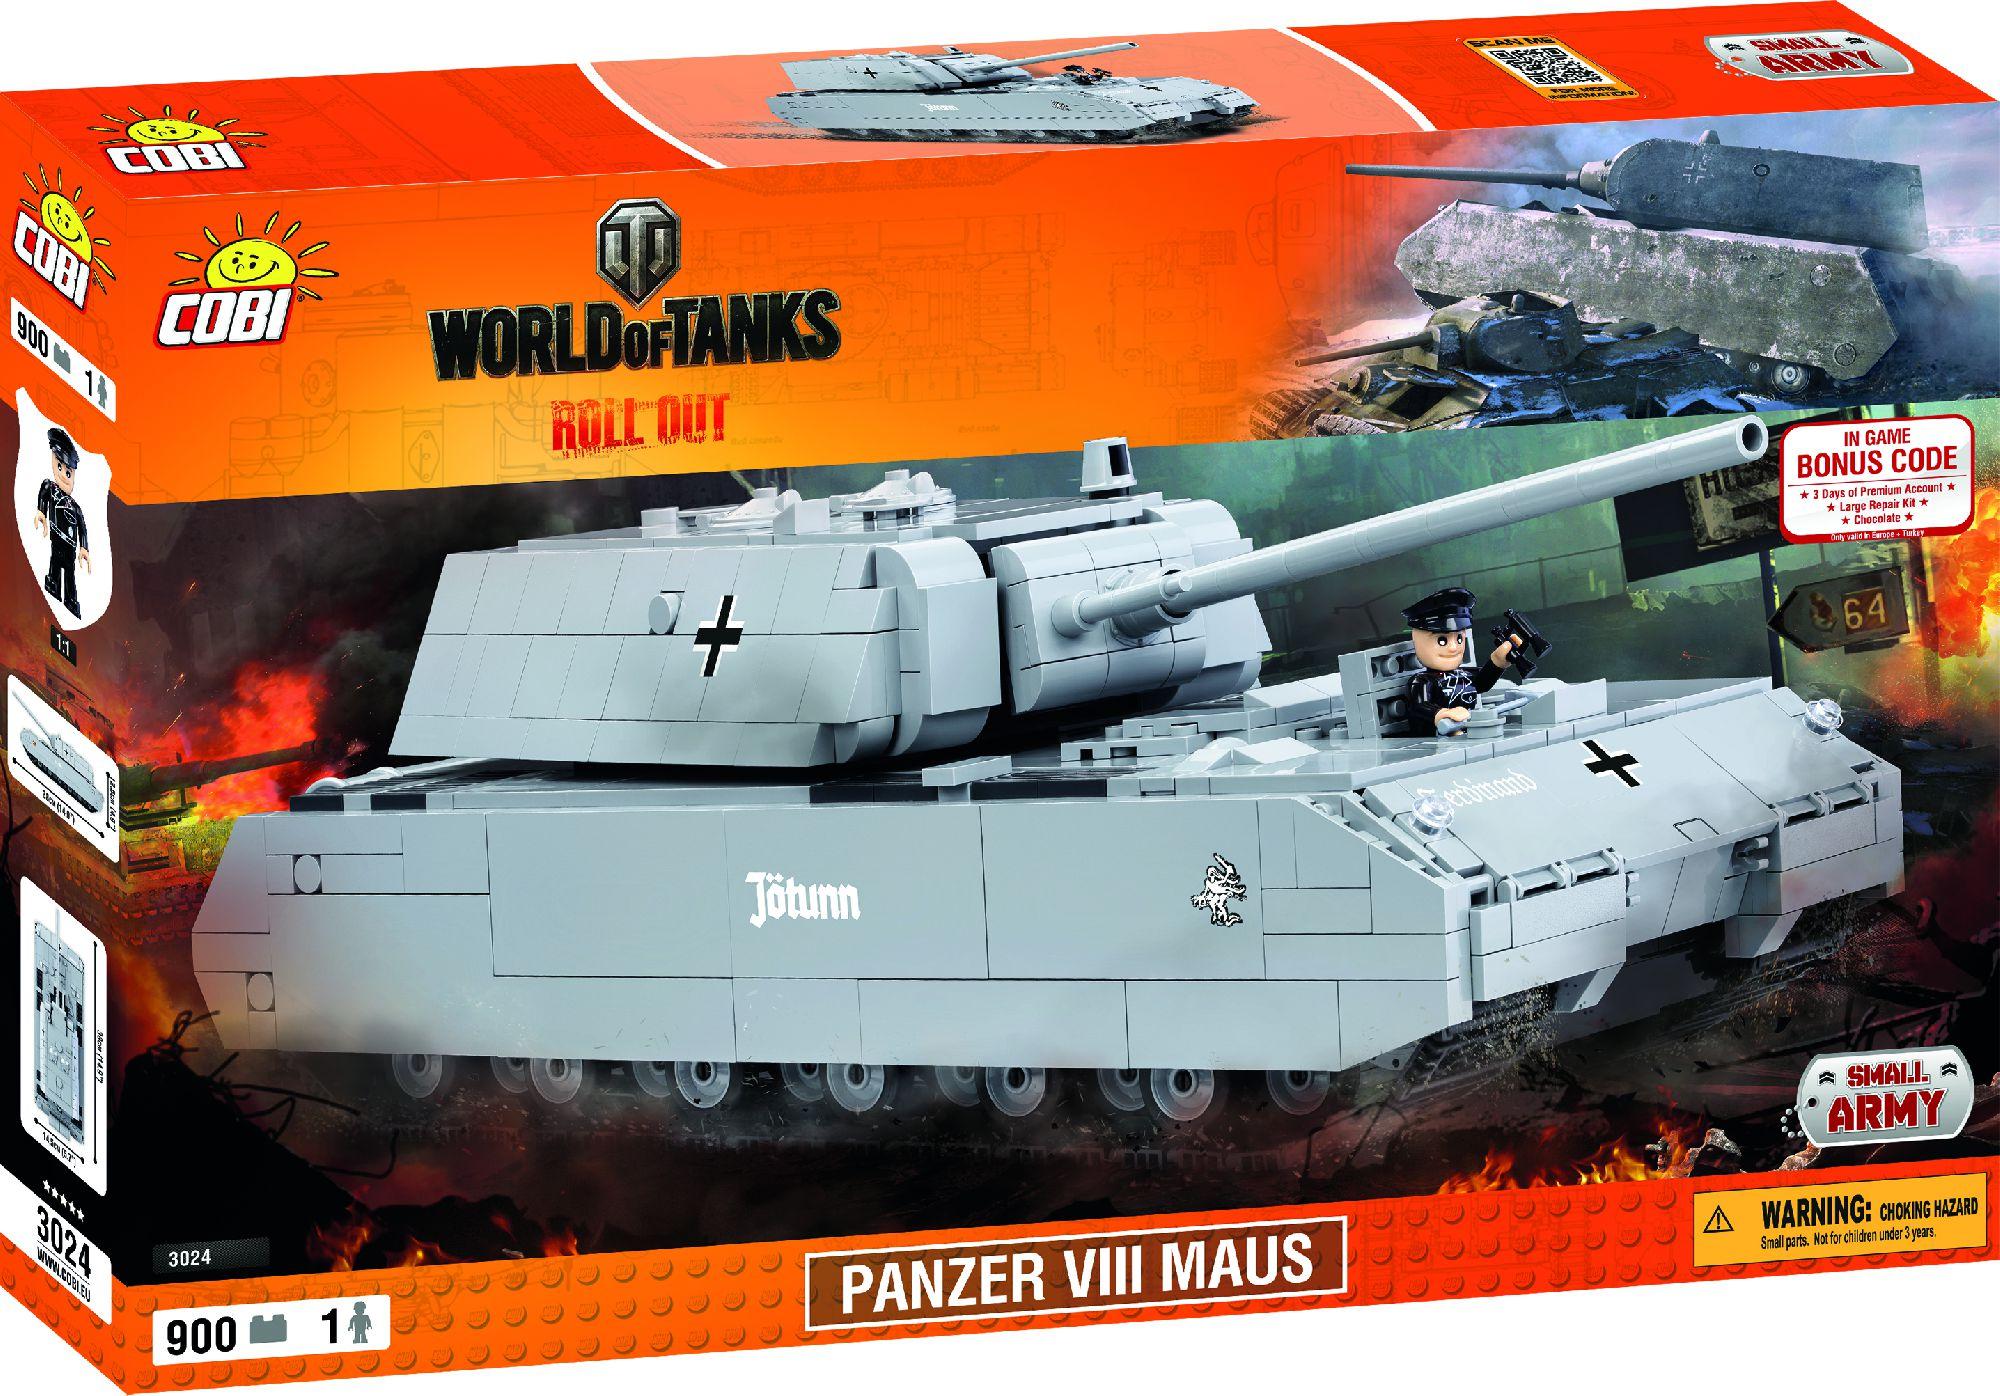 Cobi Small Army World of Tanks SDKFZ (COBI-3024) konstruktors